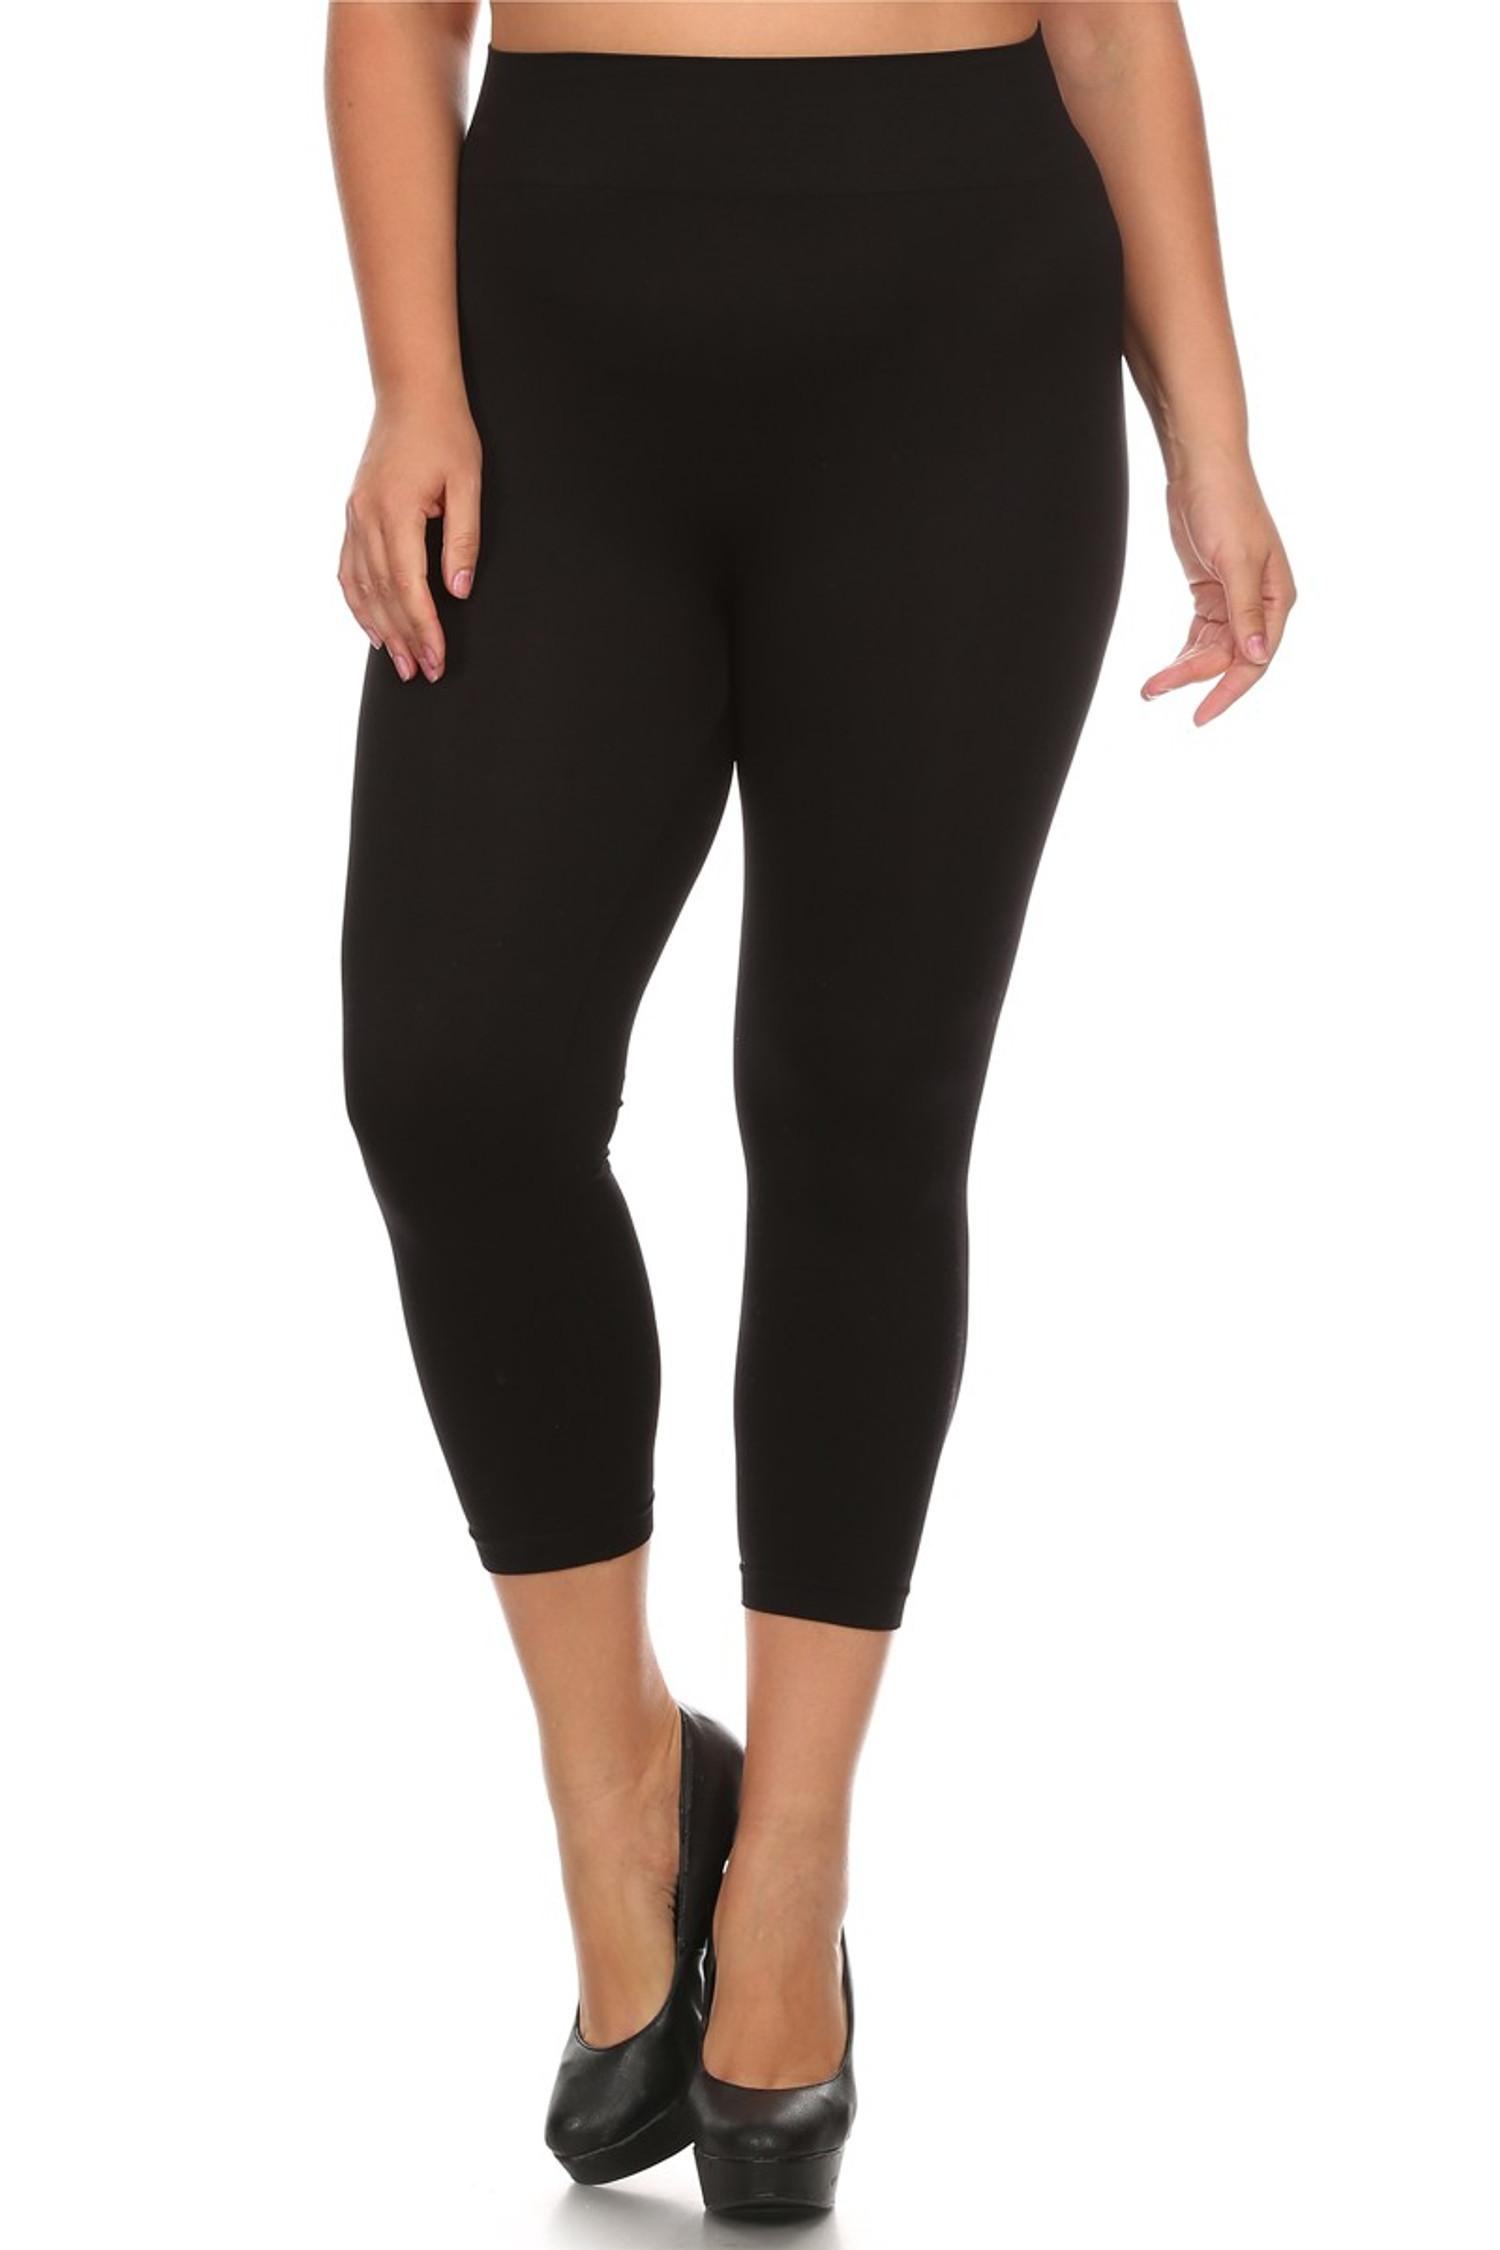 Black Basic Spandex Capri Plus Size Leggings